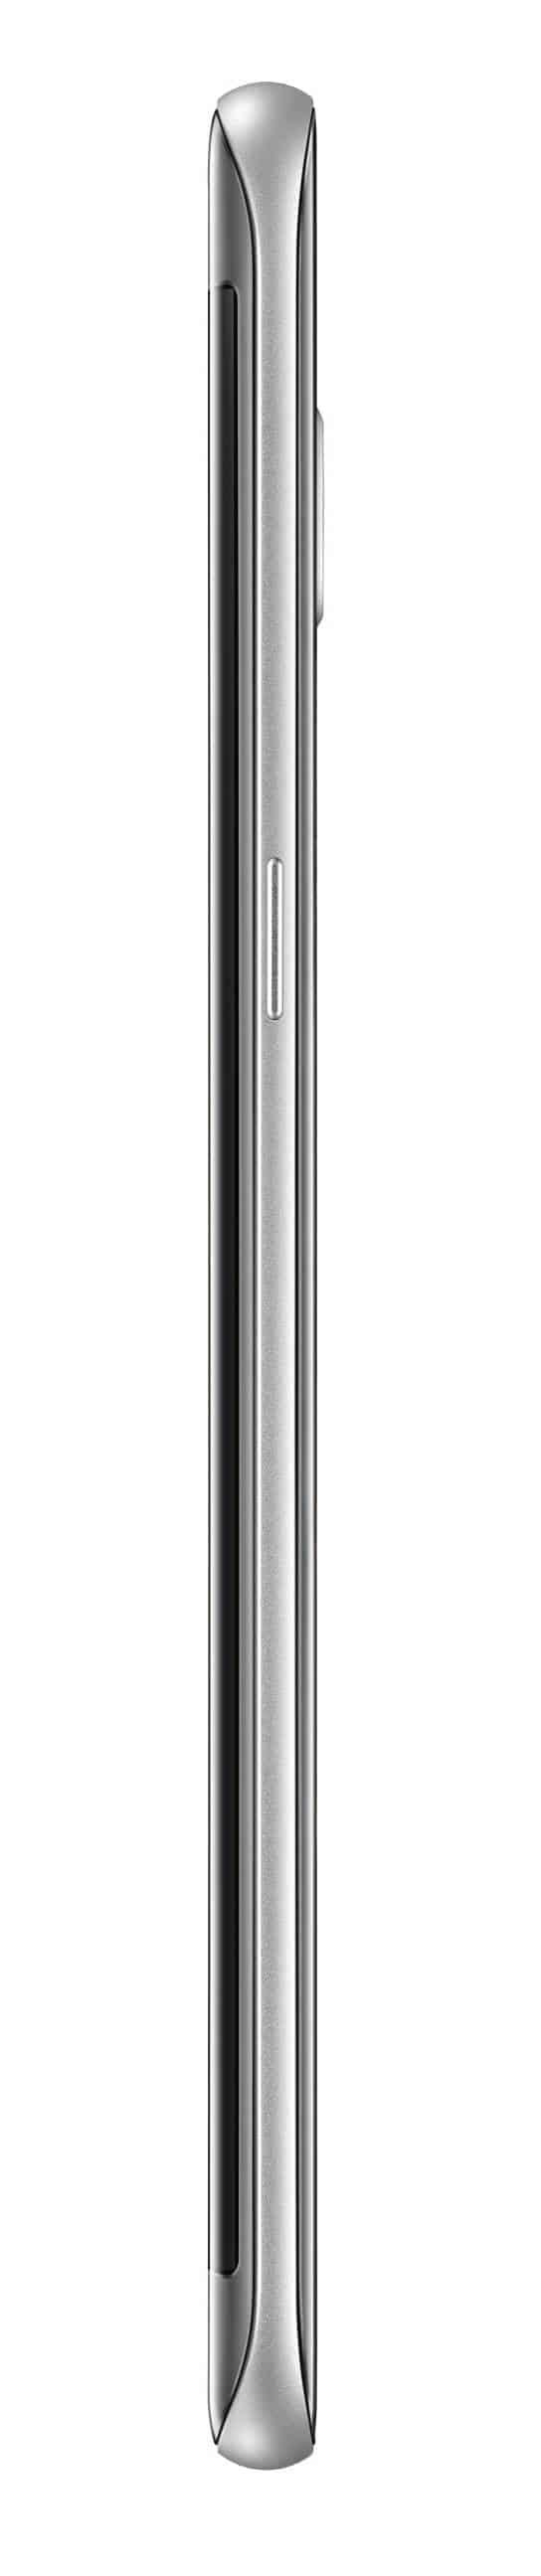 Galaxy S7 EDGE PRESS 12